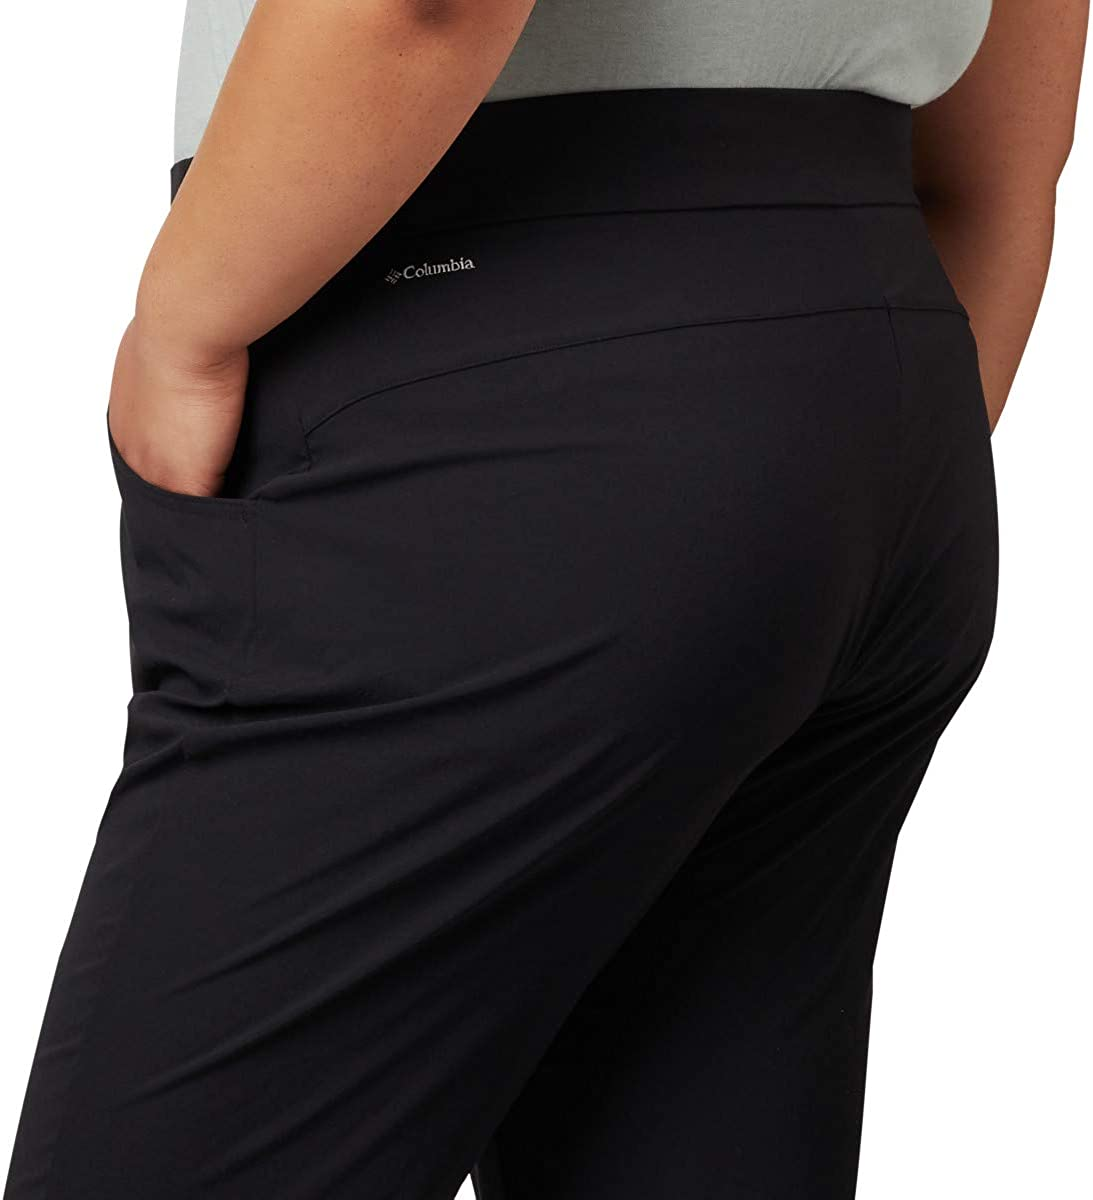 Columbia Womens Back Beauty Skinny Leg Pant Pants